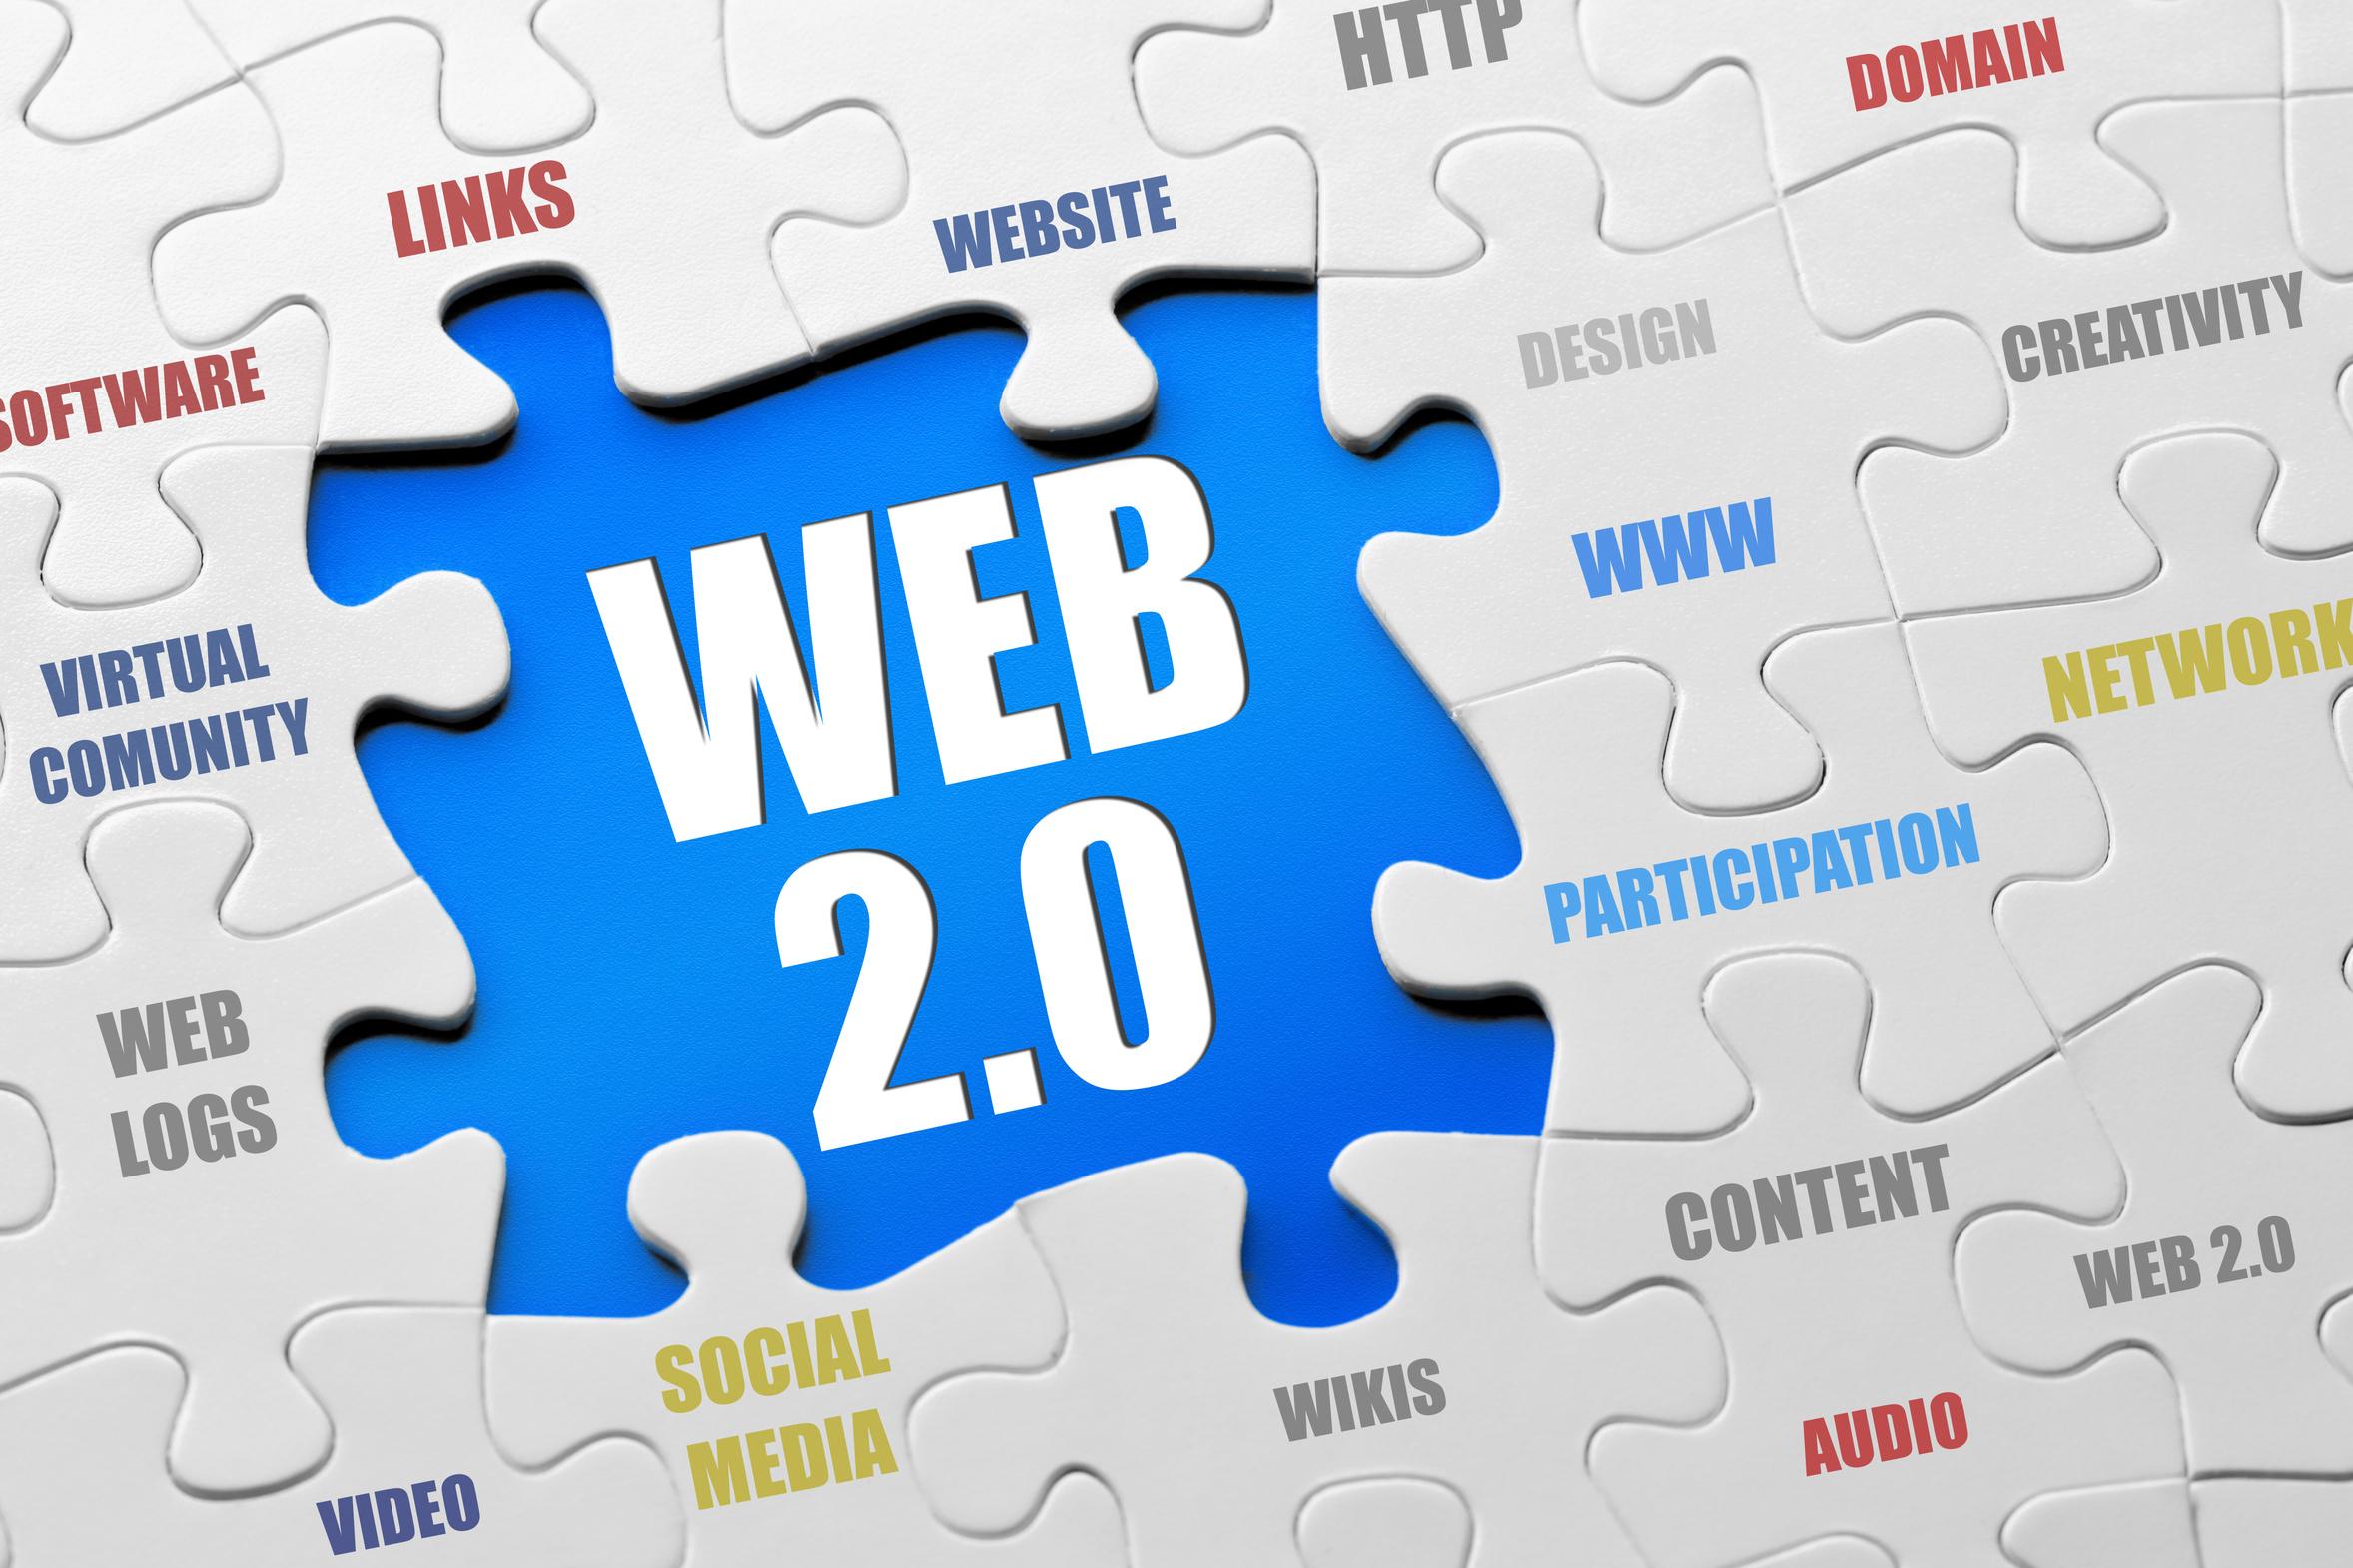 Get 800 Web 2.0 profiles Backlinks